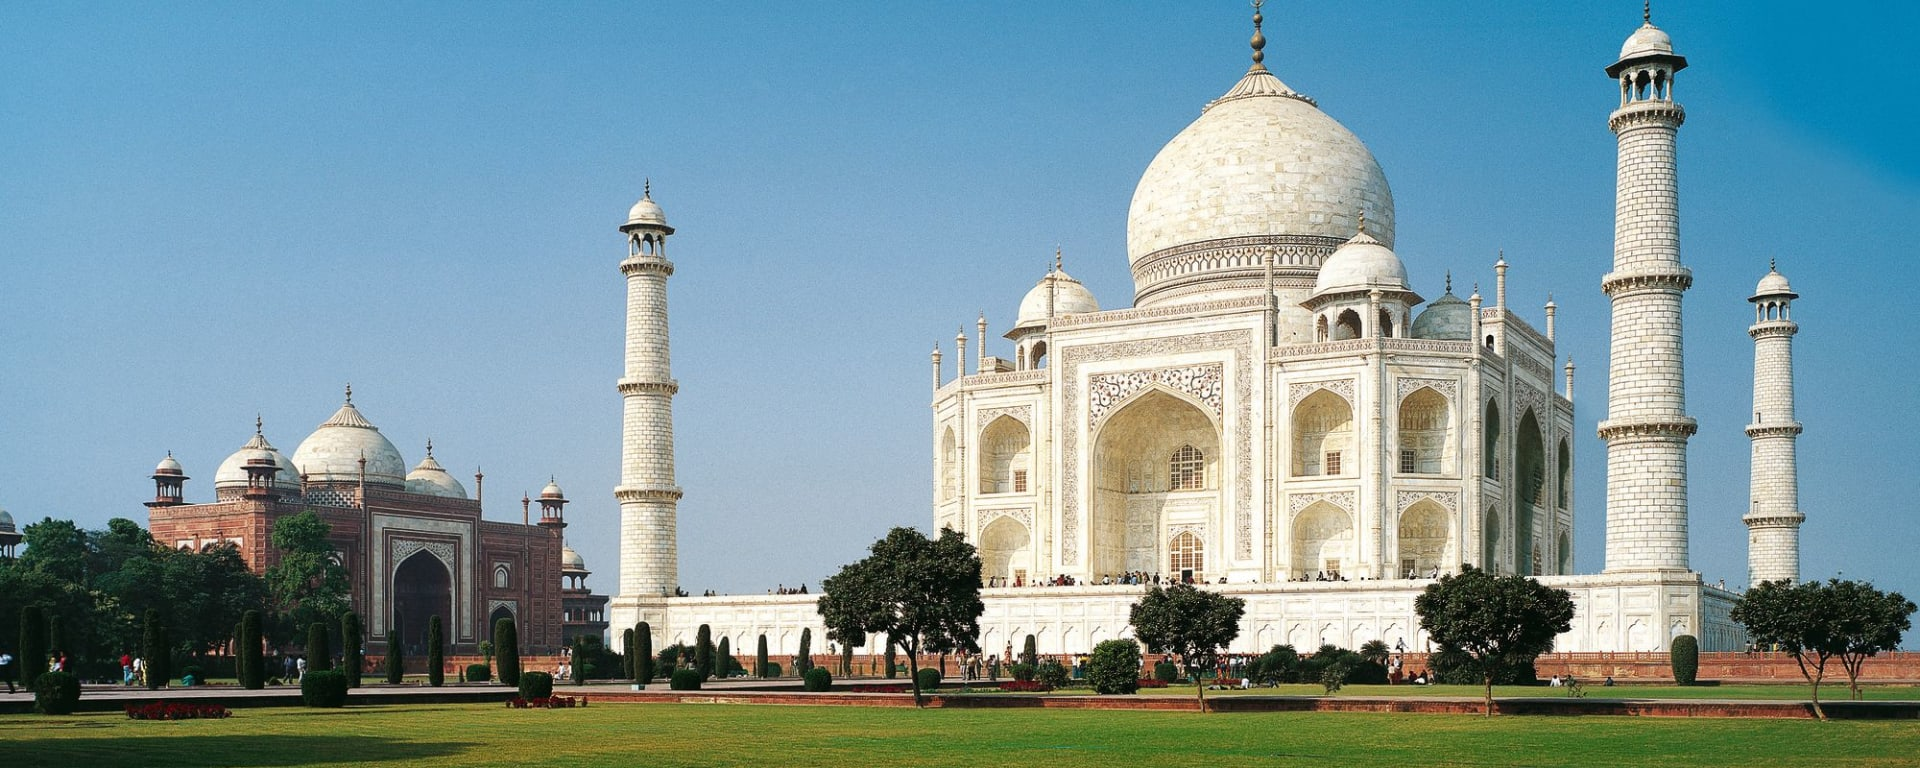 «The Deccan Odyssey» - au pays des rois de Delhi: Agra Taj Mahal